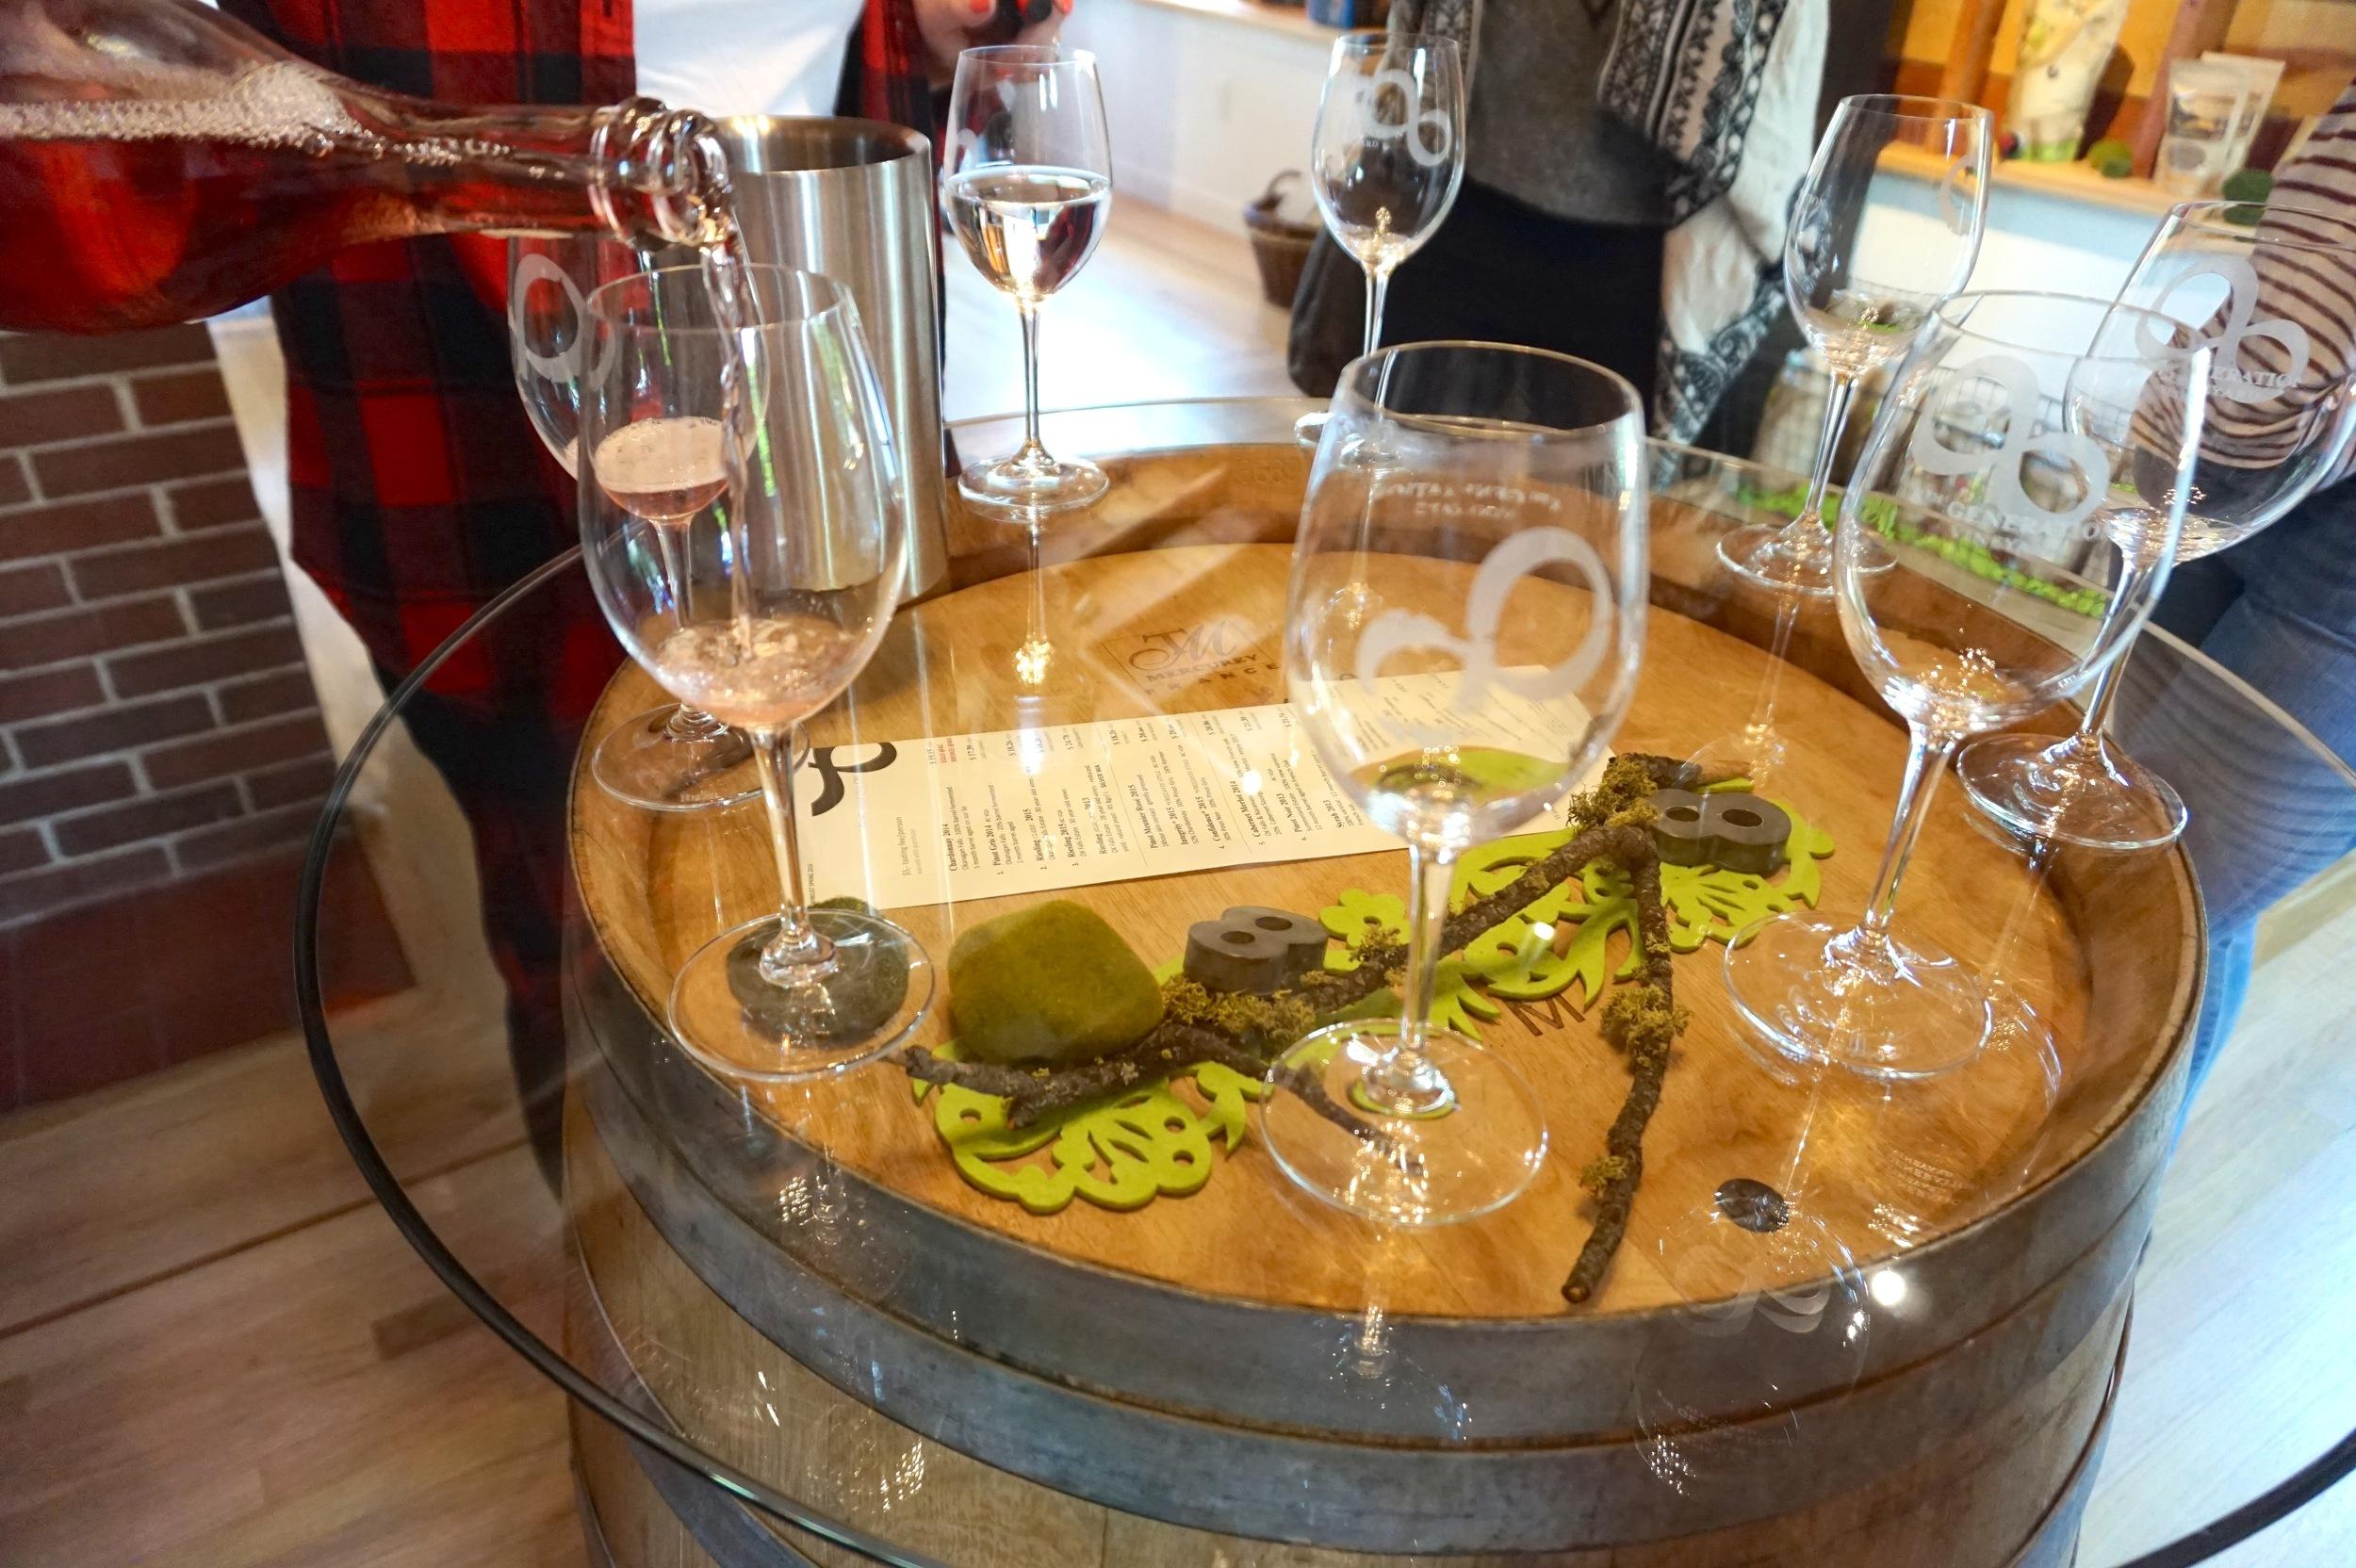 8th generation wine